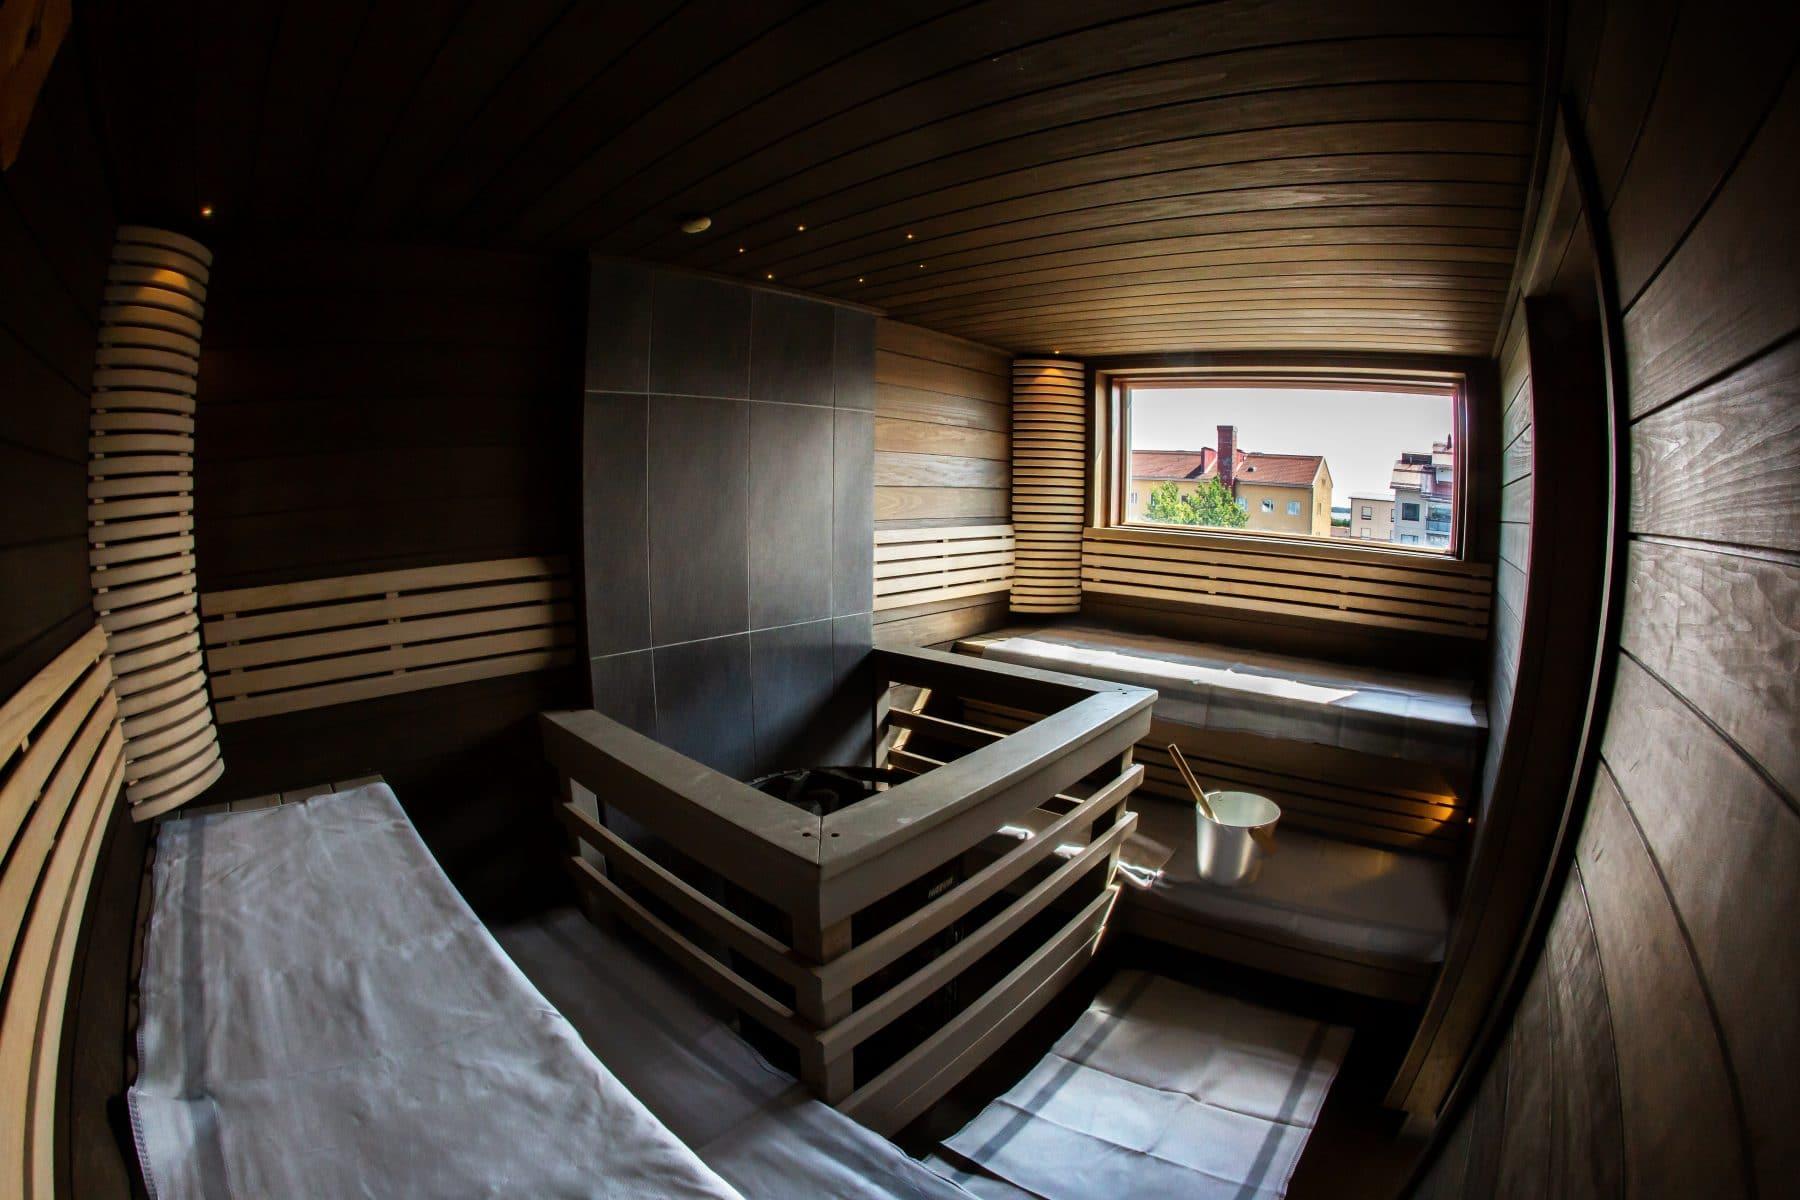 `Original Finnish Sauna Experience at the interbad 2020...